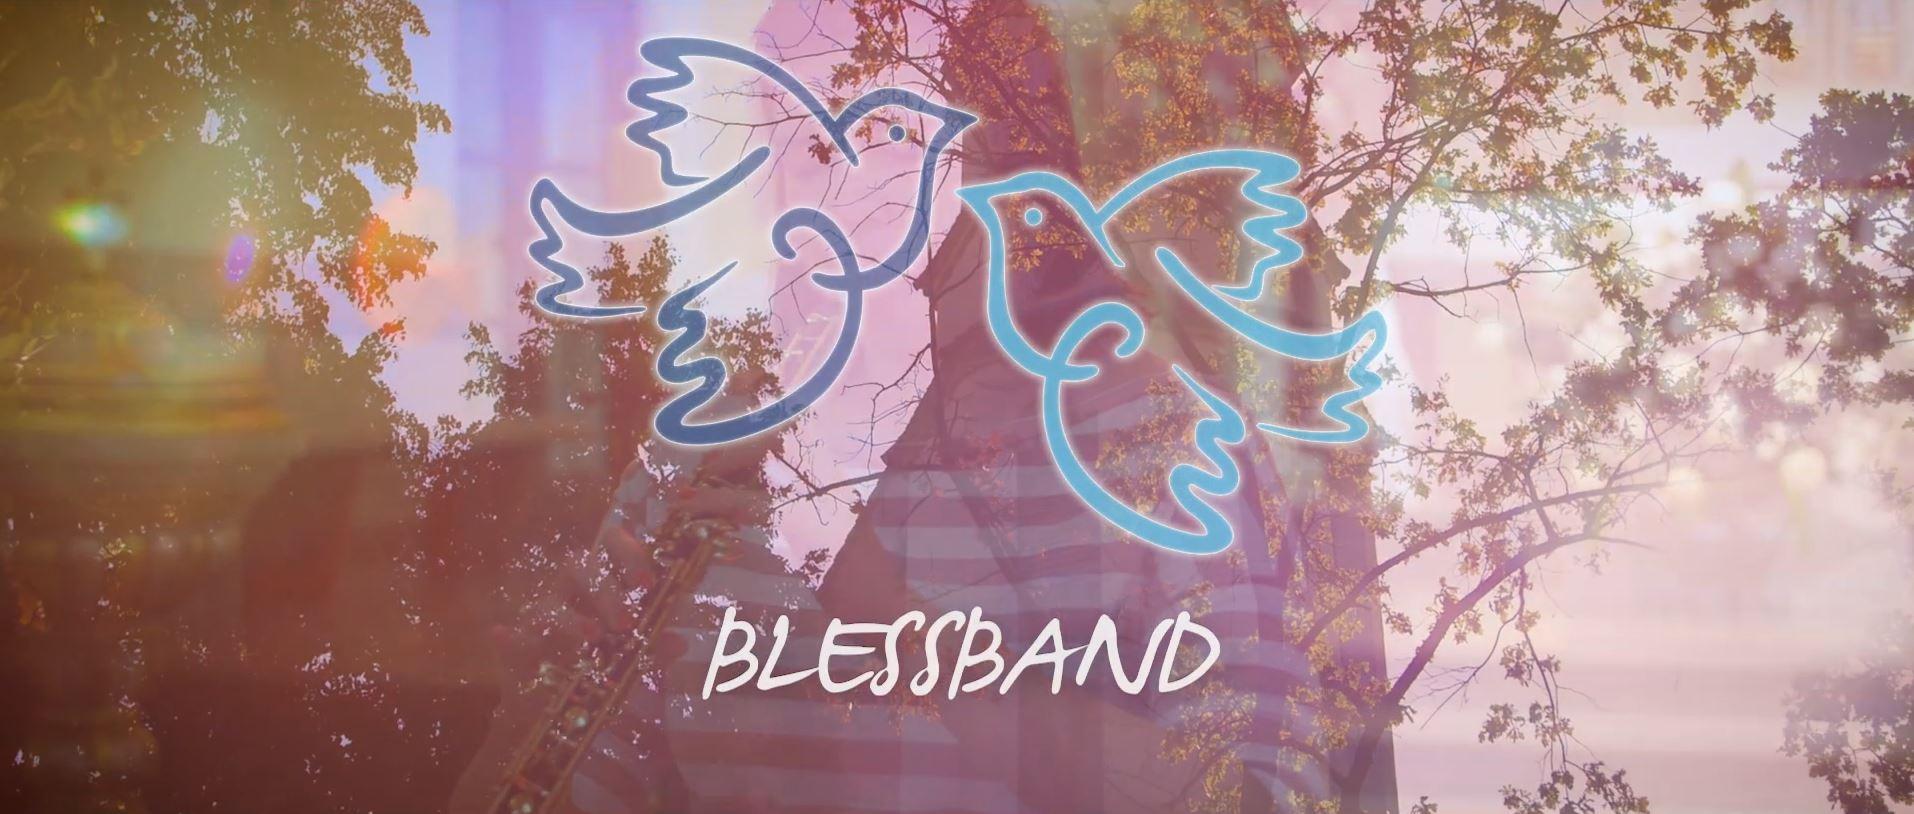 blessband1